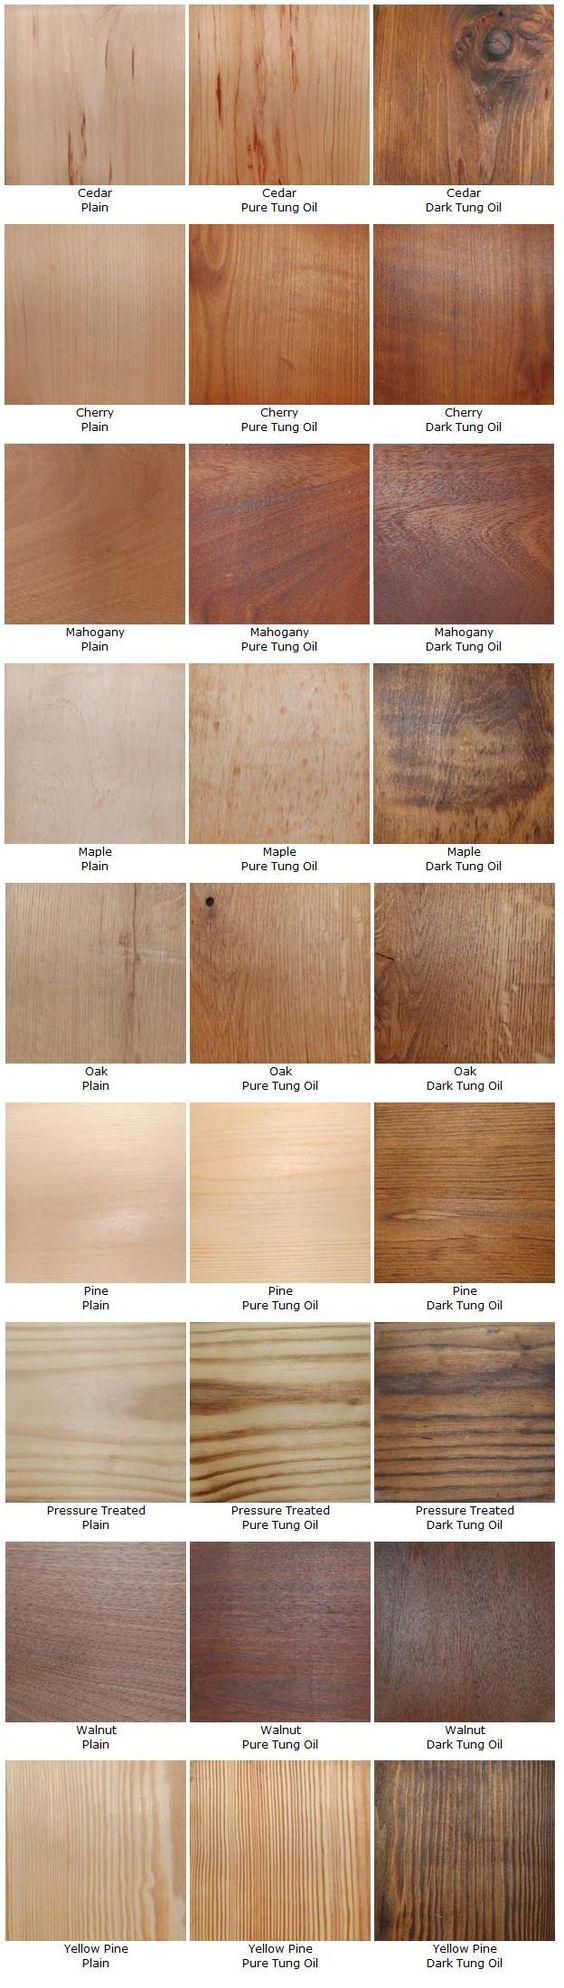 Pure Vs Dark Tung Oil Wood In 2018 Pinterest Pin Wiring Diagram Dash Jpg On B63199be59578ebc3b4b431eb1e03a84 5641988 Texture Colors Products